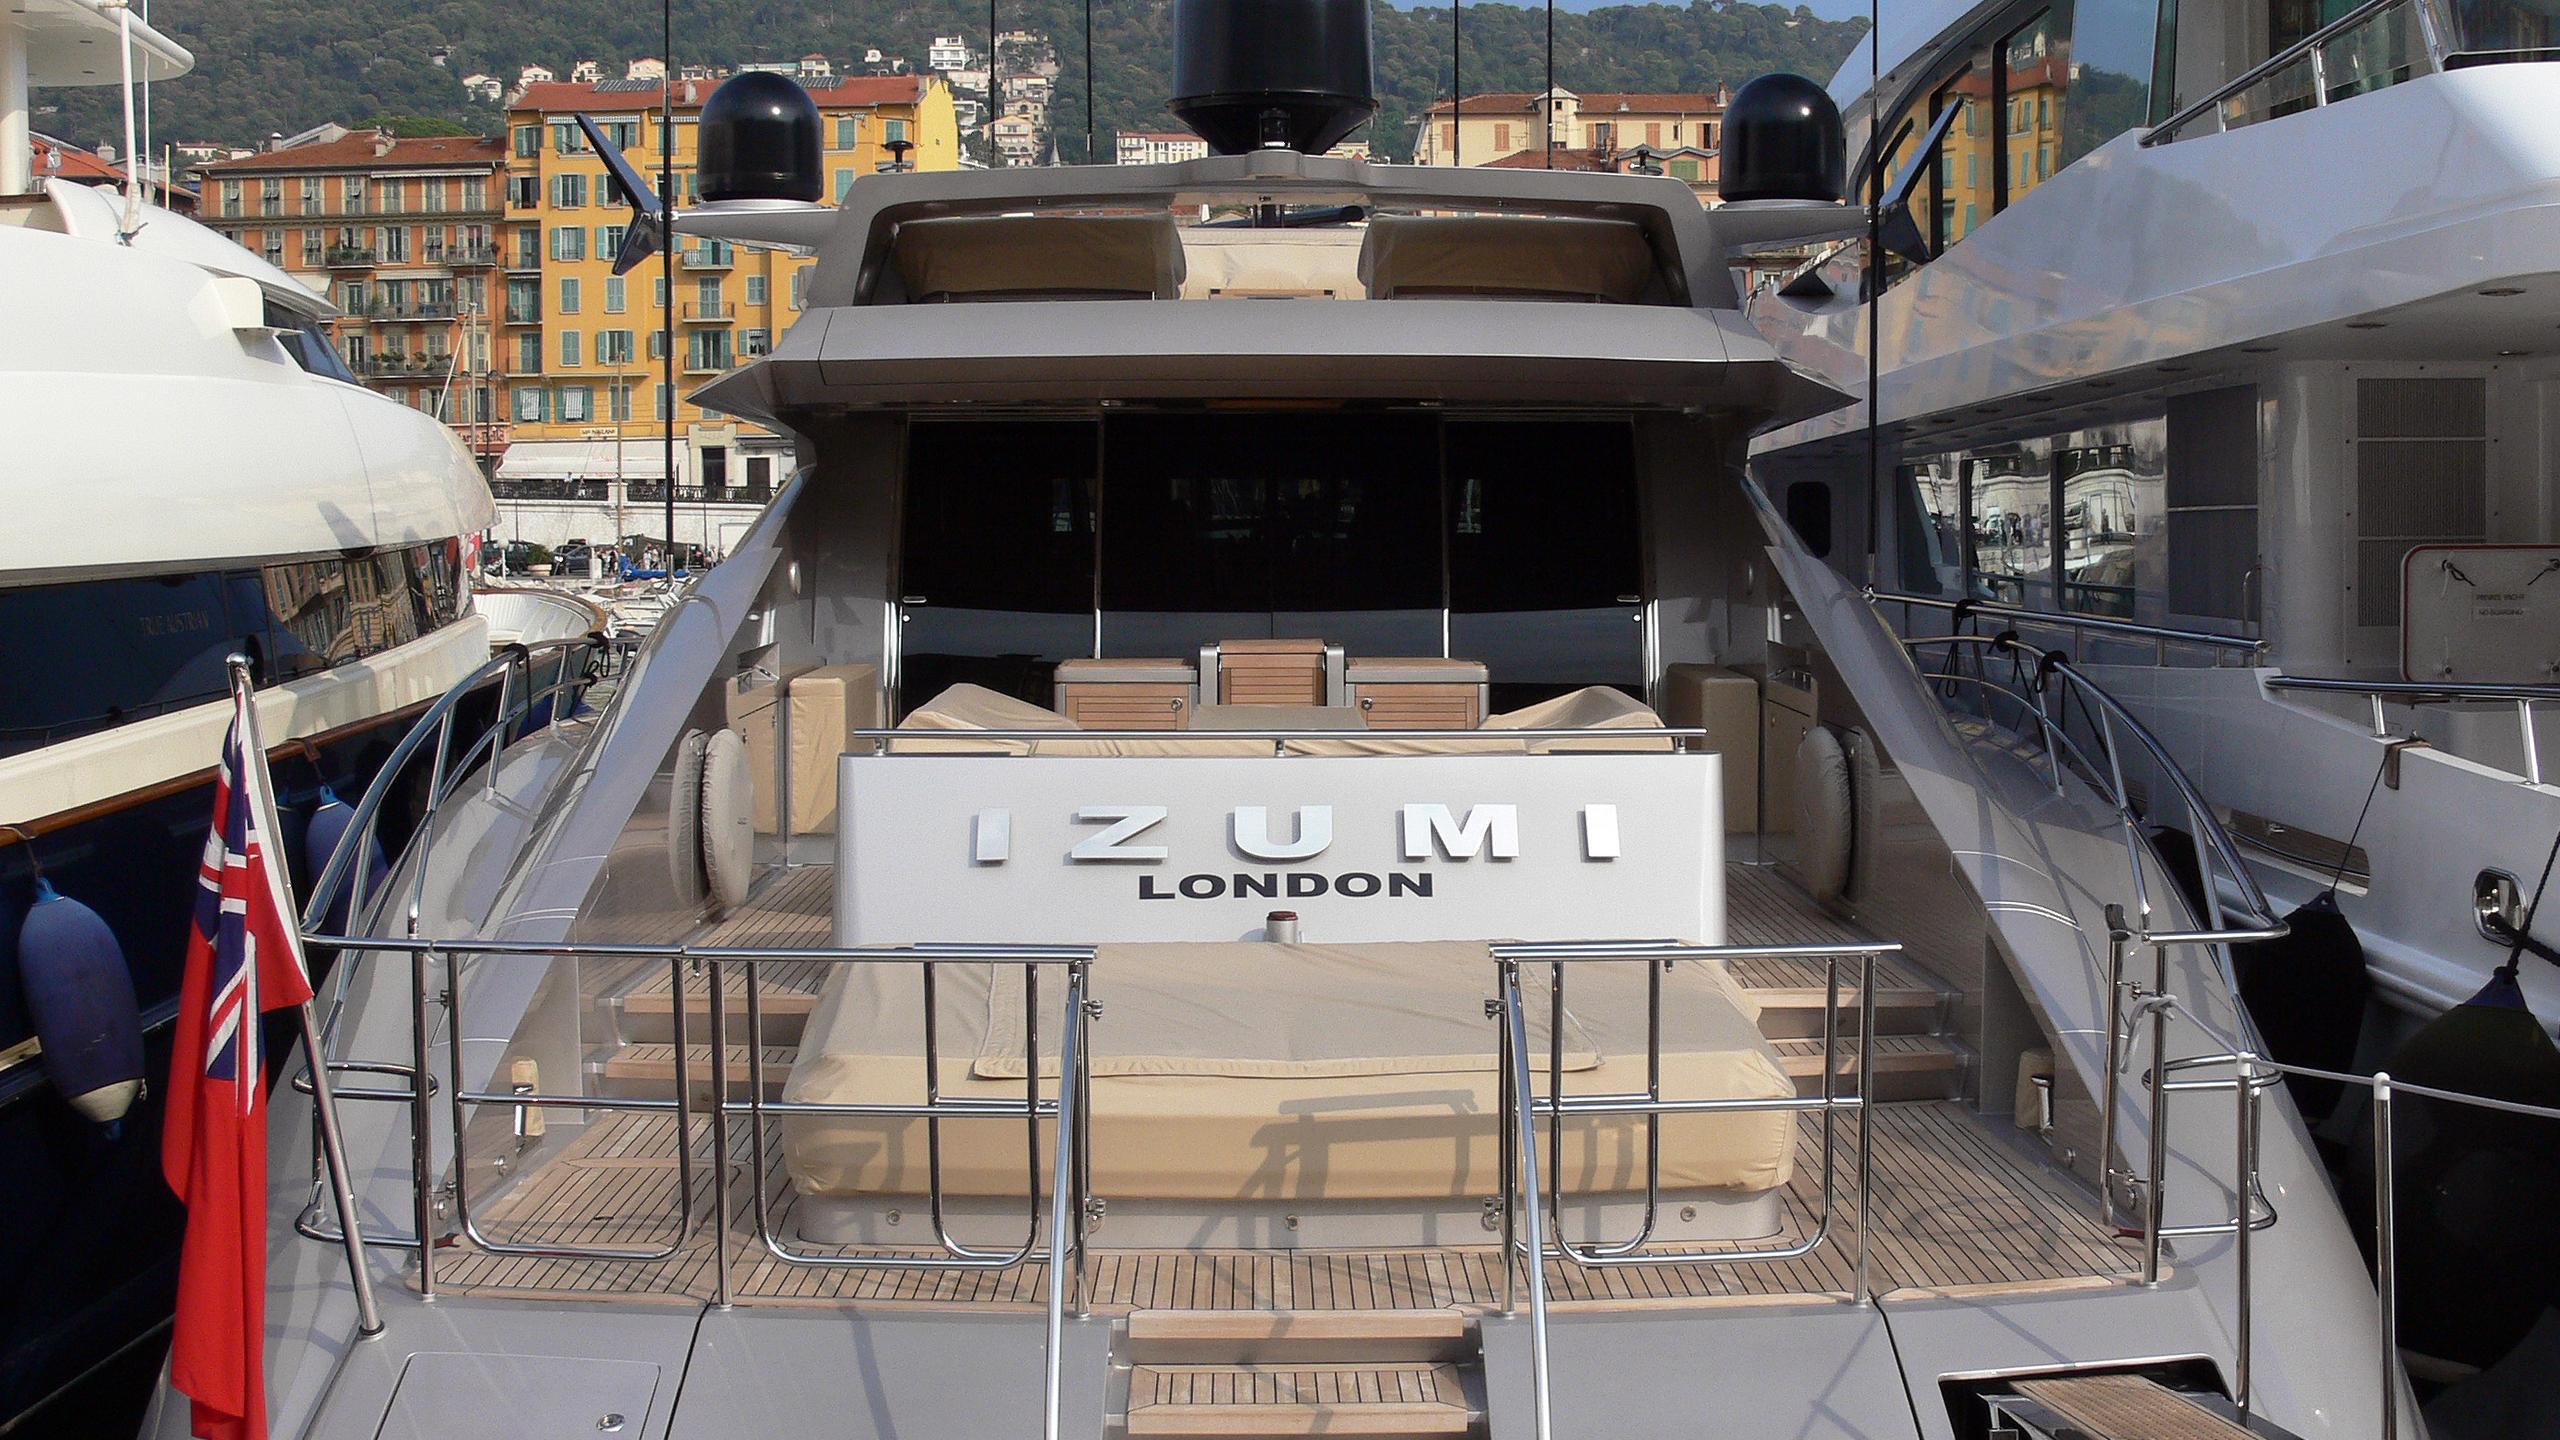 izumi-motor-yacht-palmer-johnson-120-my-2008-37m-stern